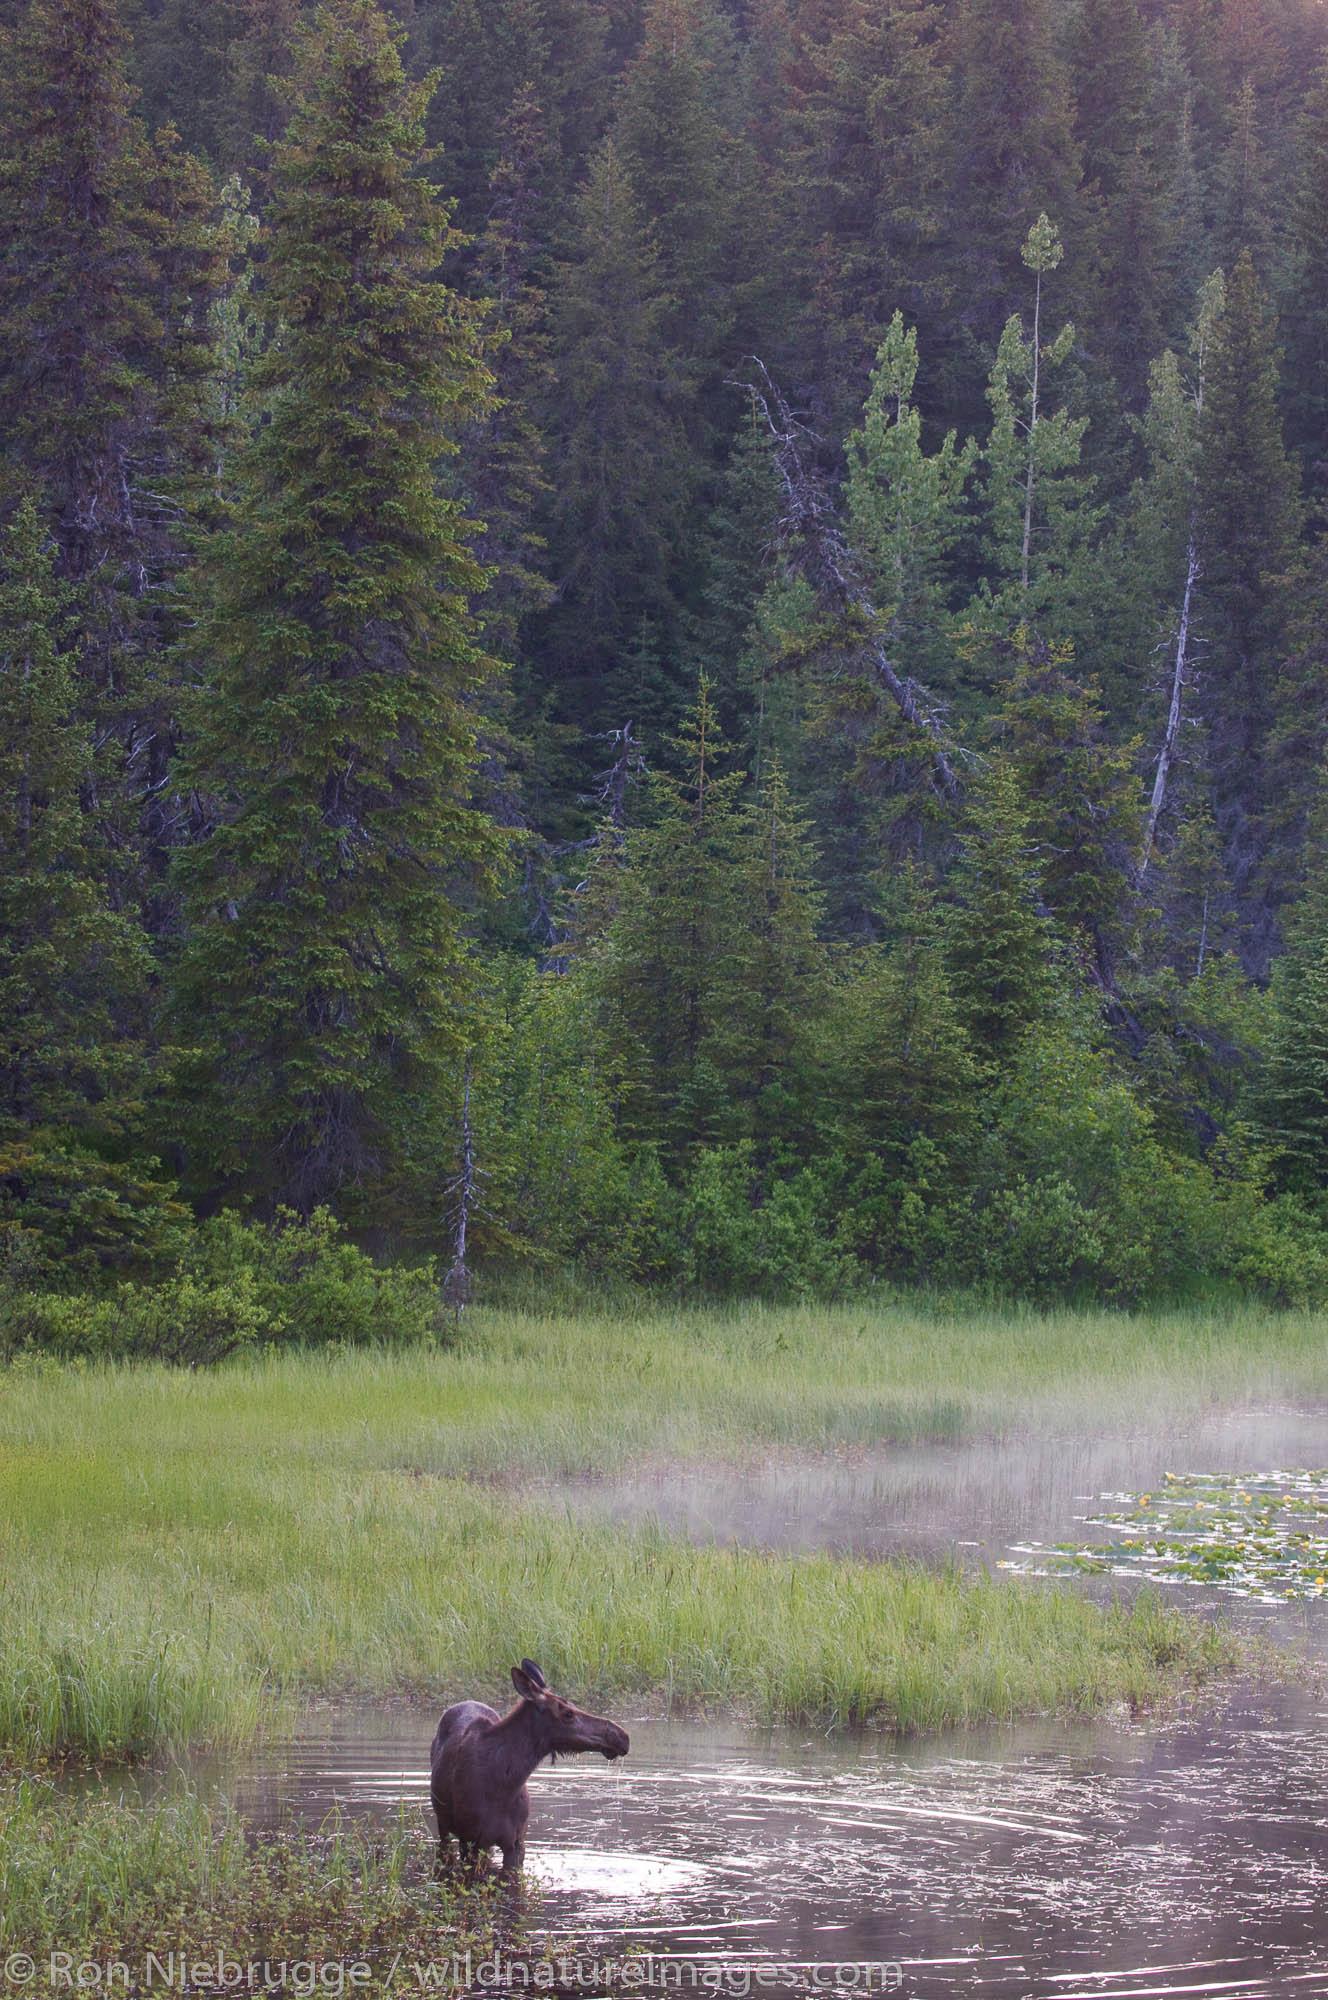 A young moose, Chugach National Forest, Alaska.